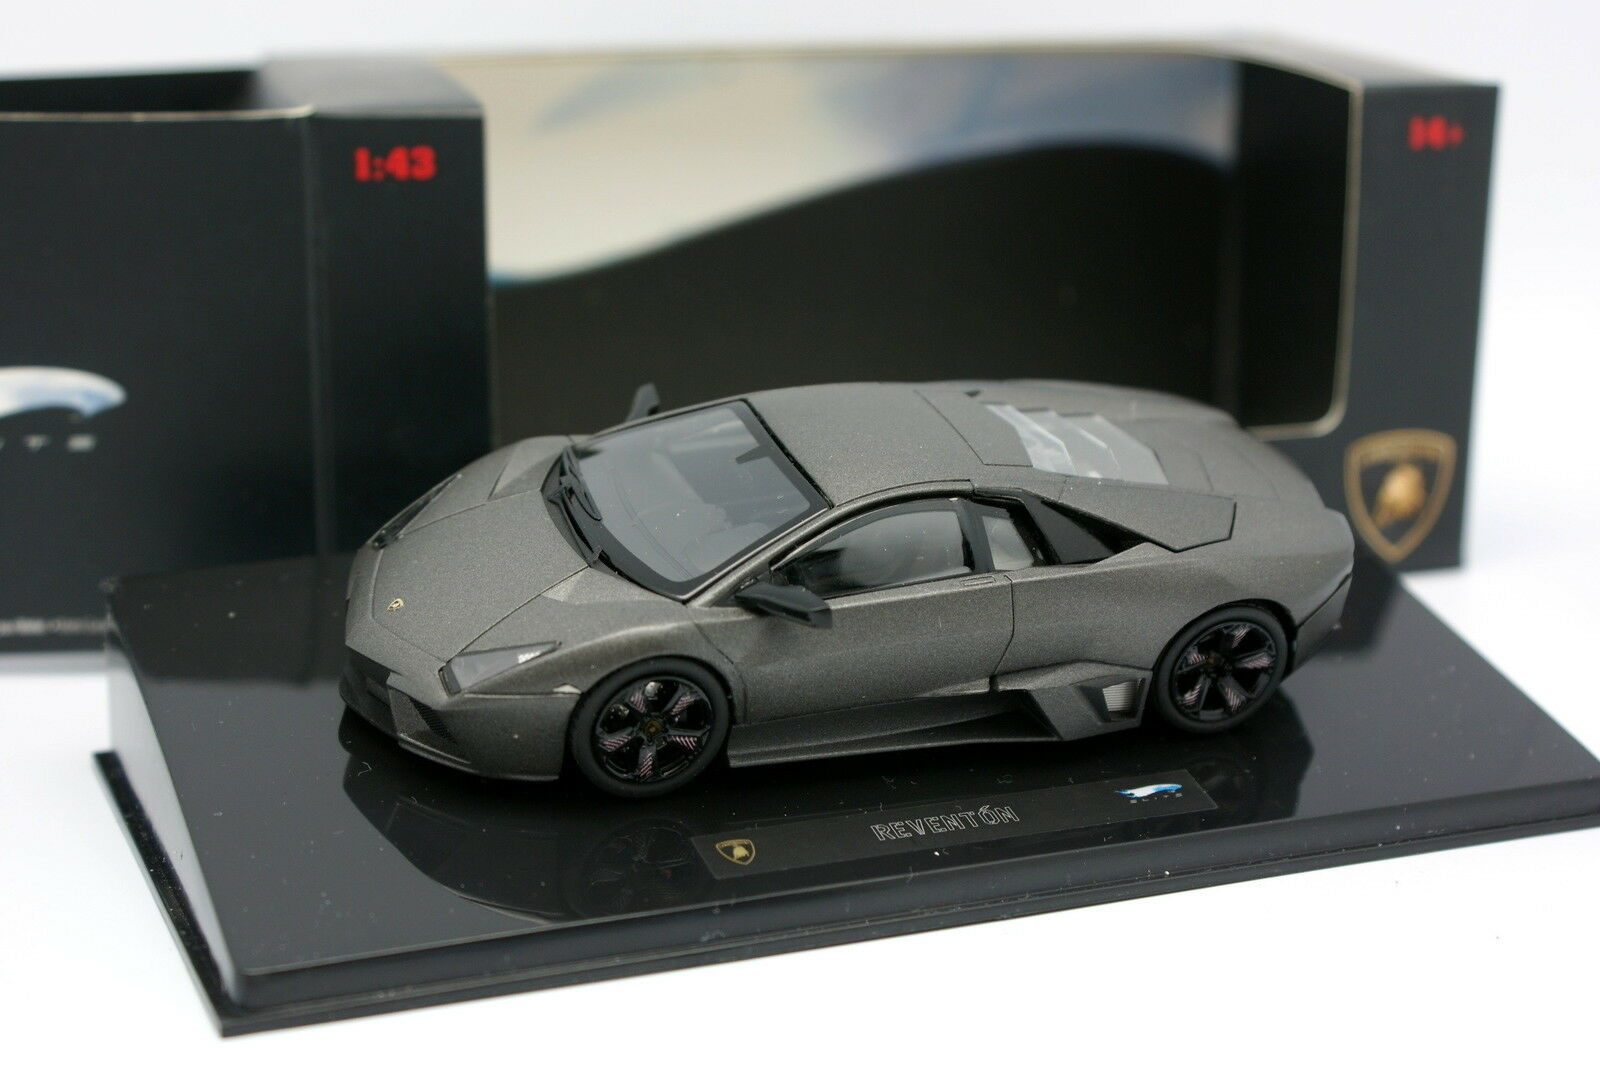 Hot Wheels 1 43 - Lamborghini Reventon